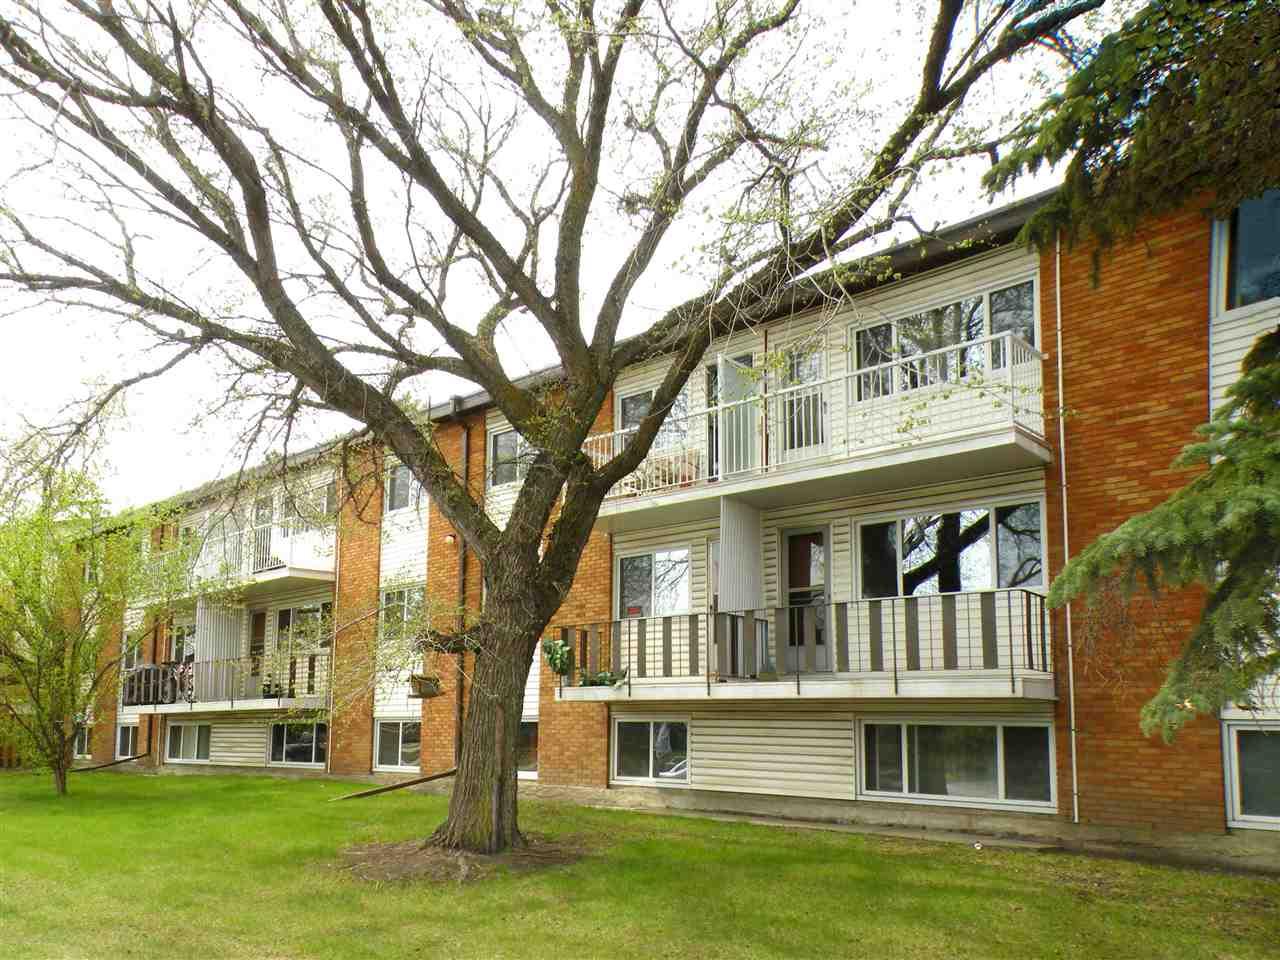 Buliding: 14903 92 Avenue, Edmonton, AB